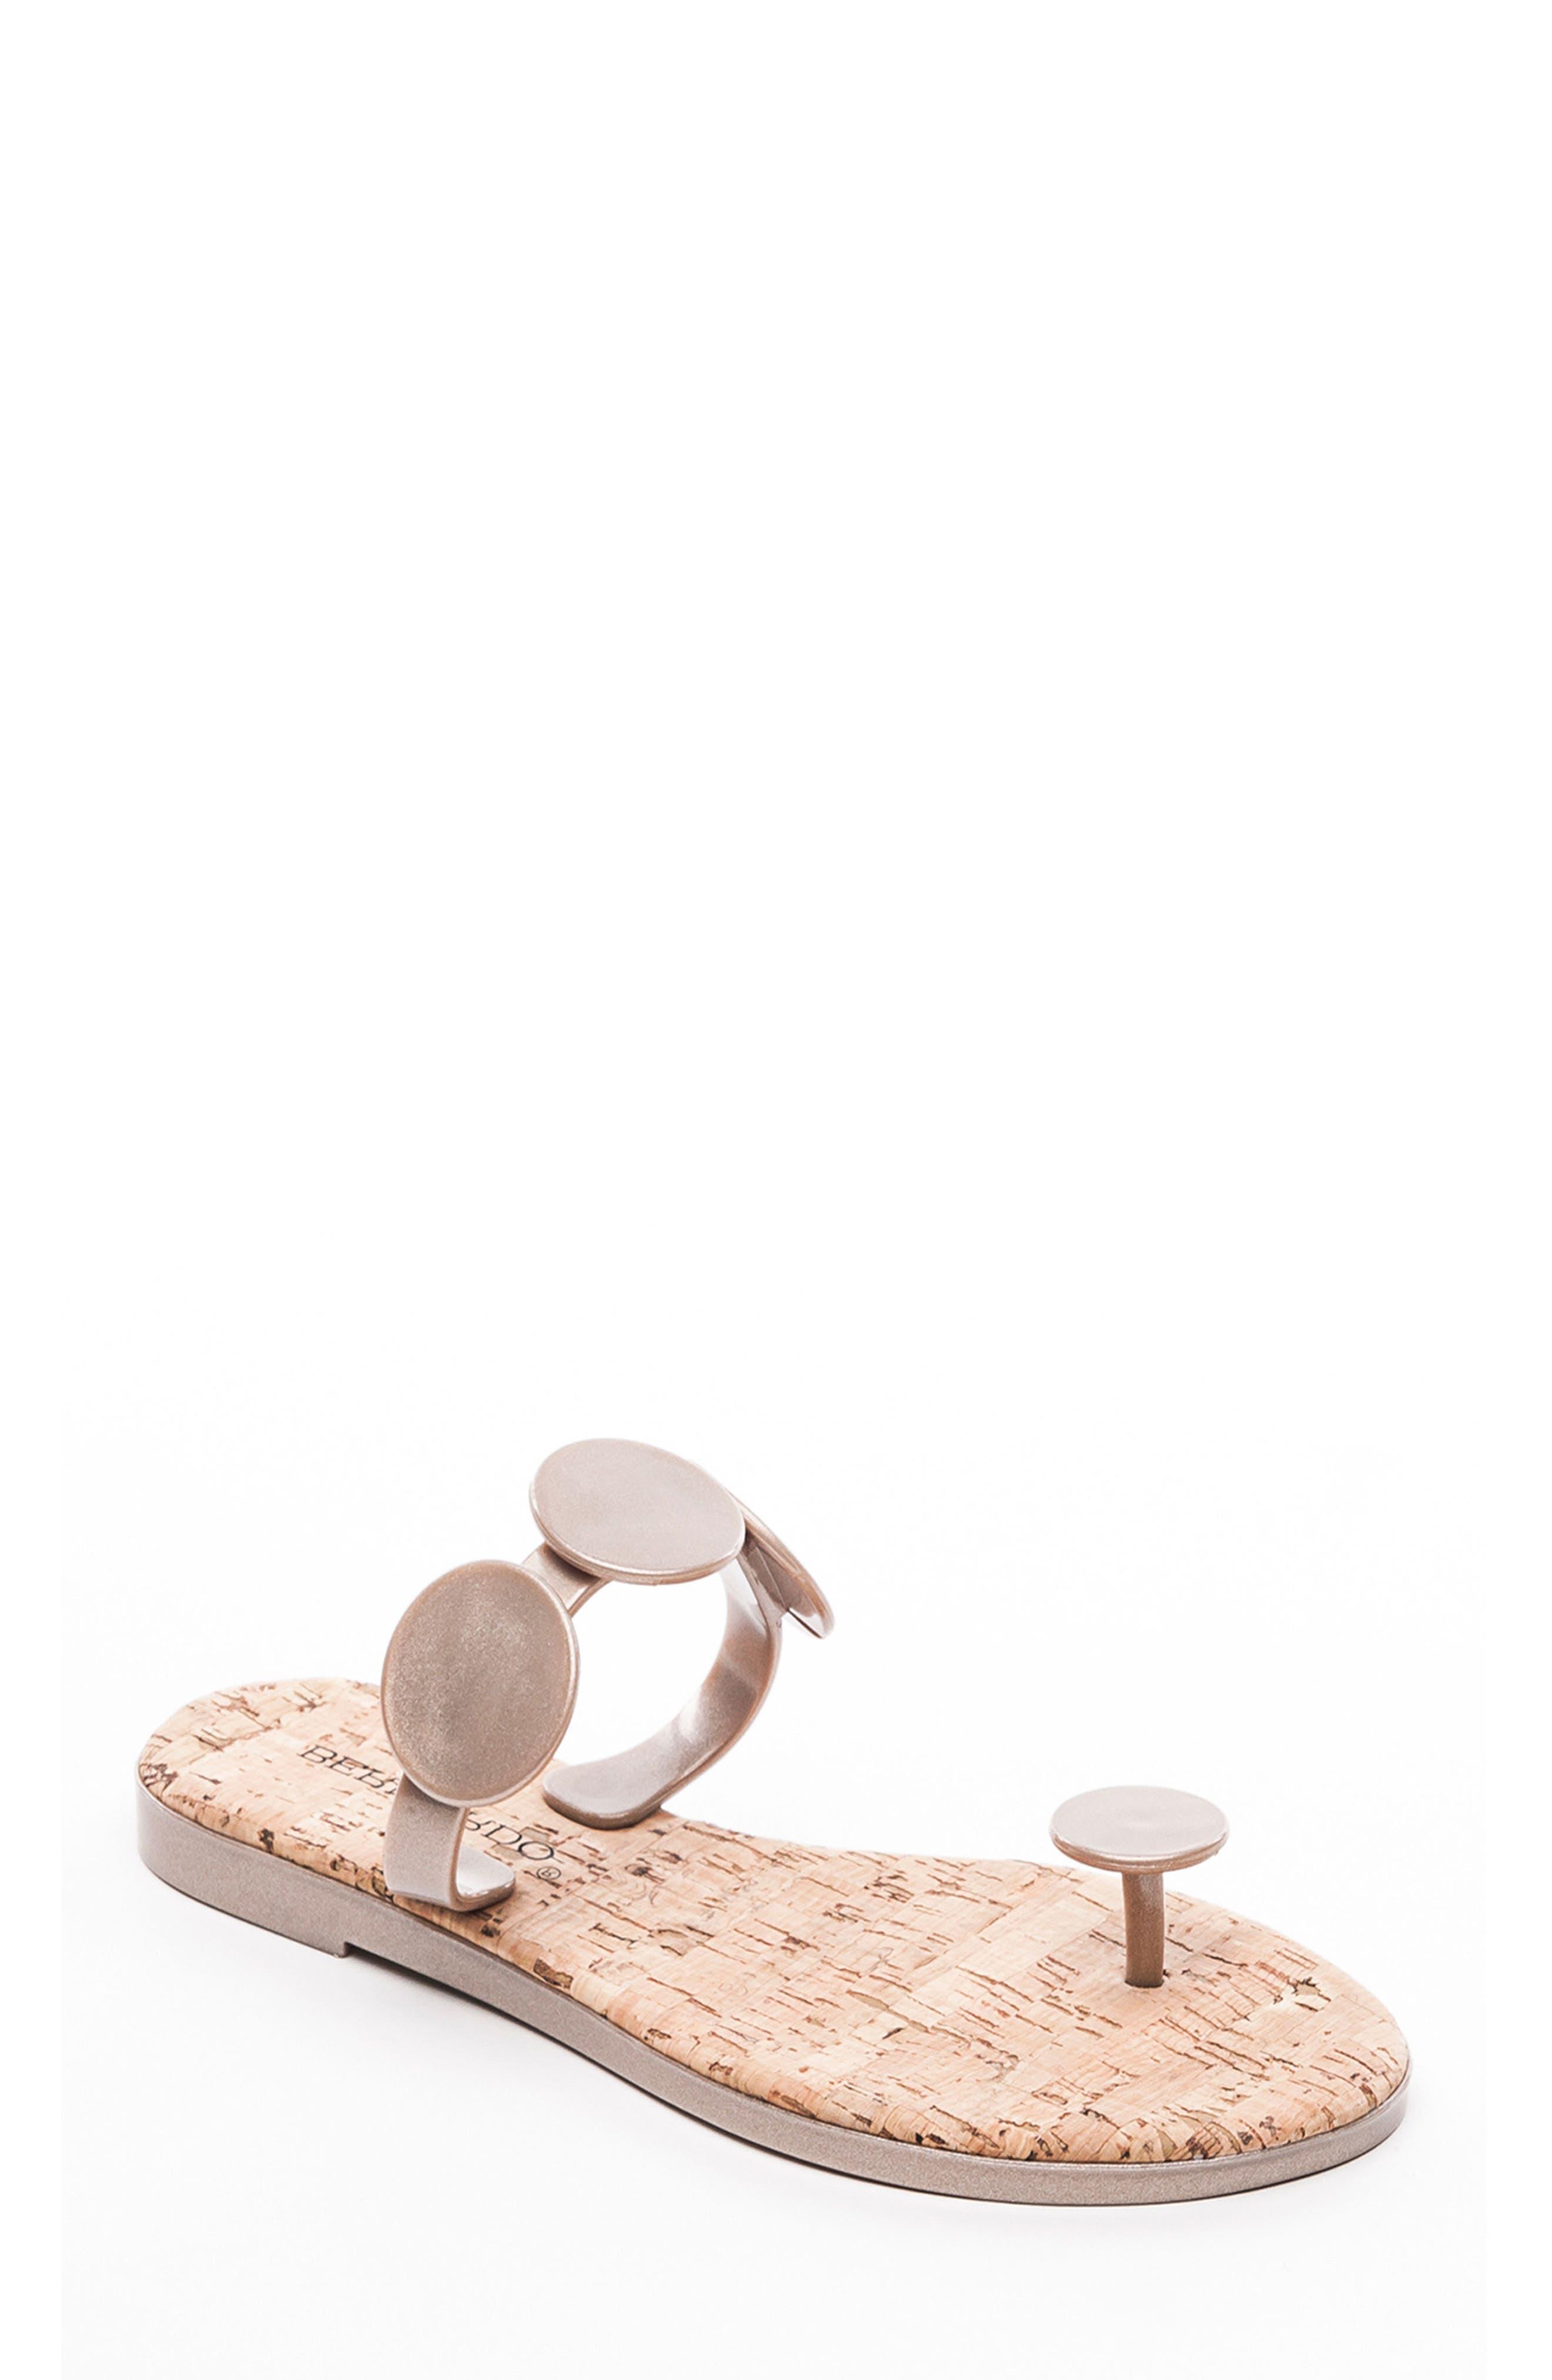 Bernardo New Moon Flip Flop, Metallic